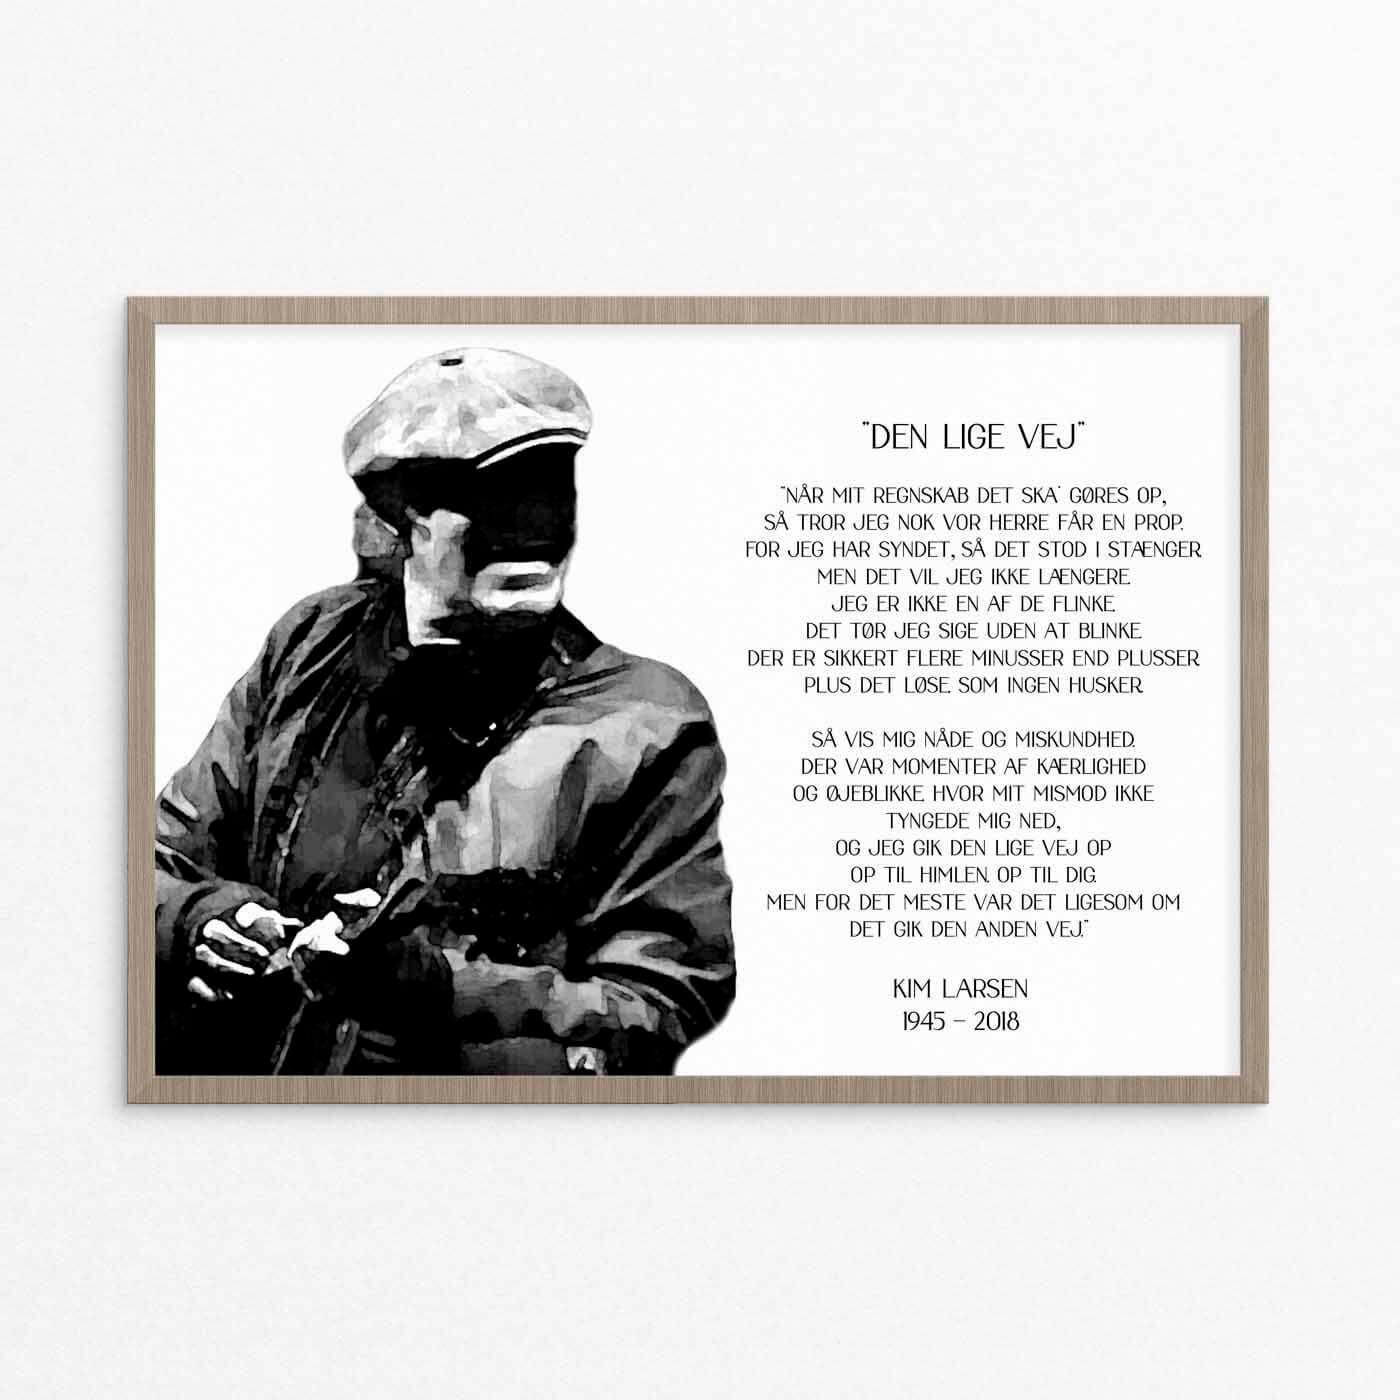 kim larsen, plakat, citat